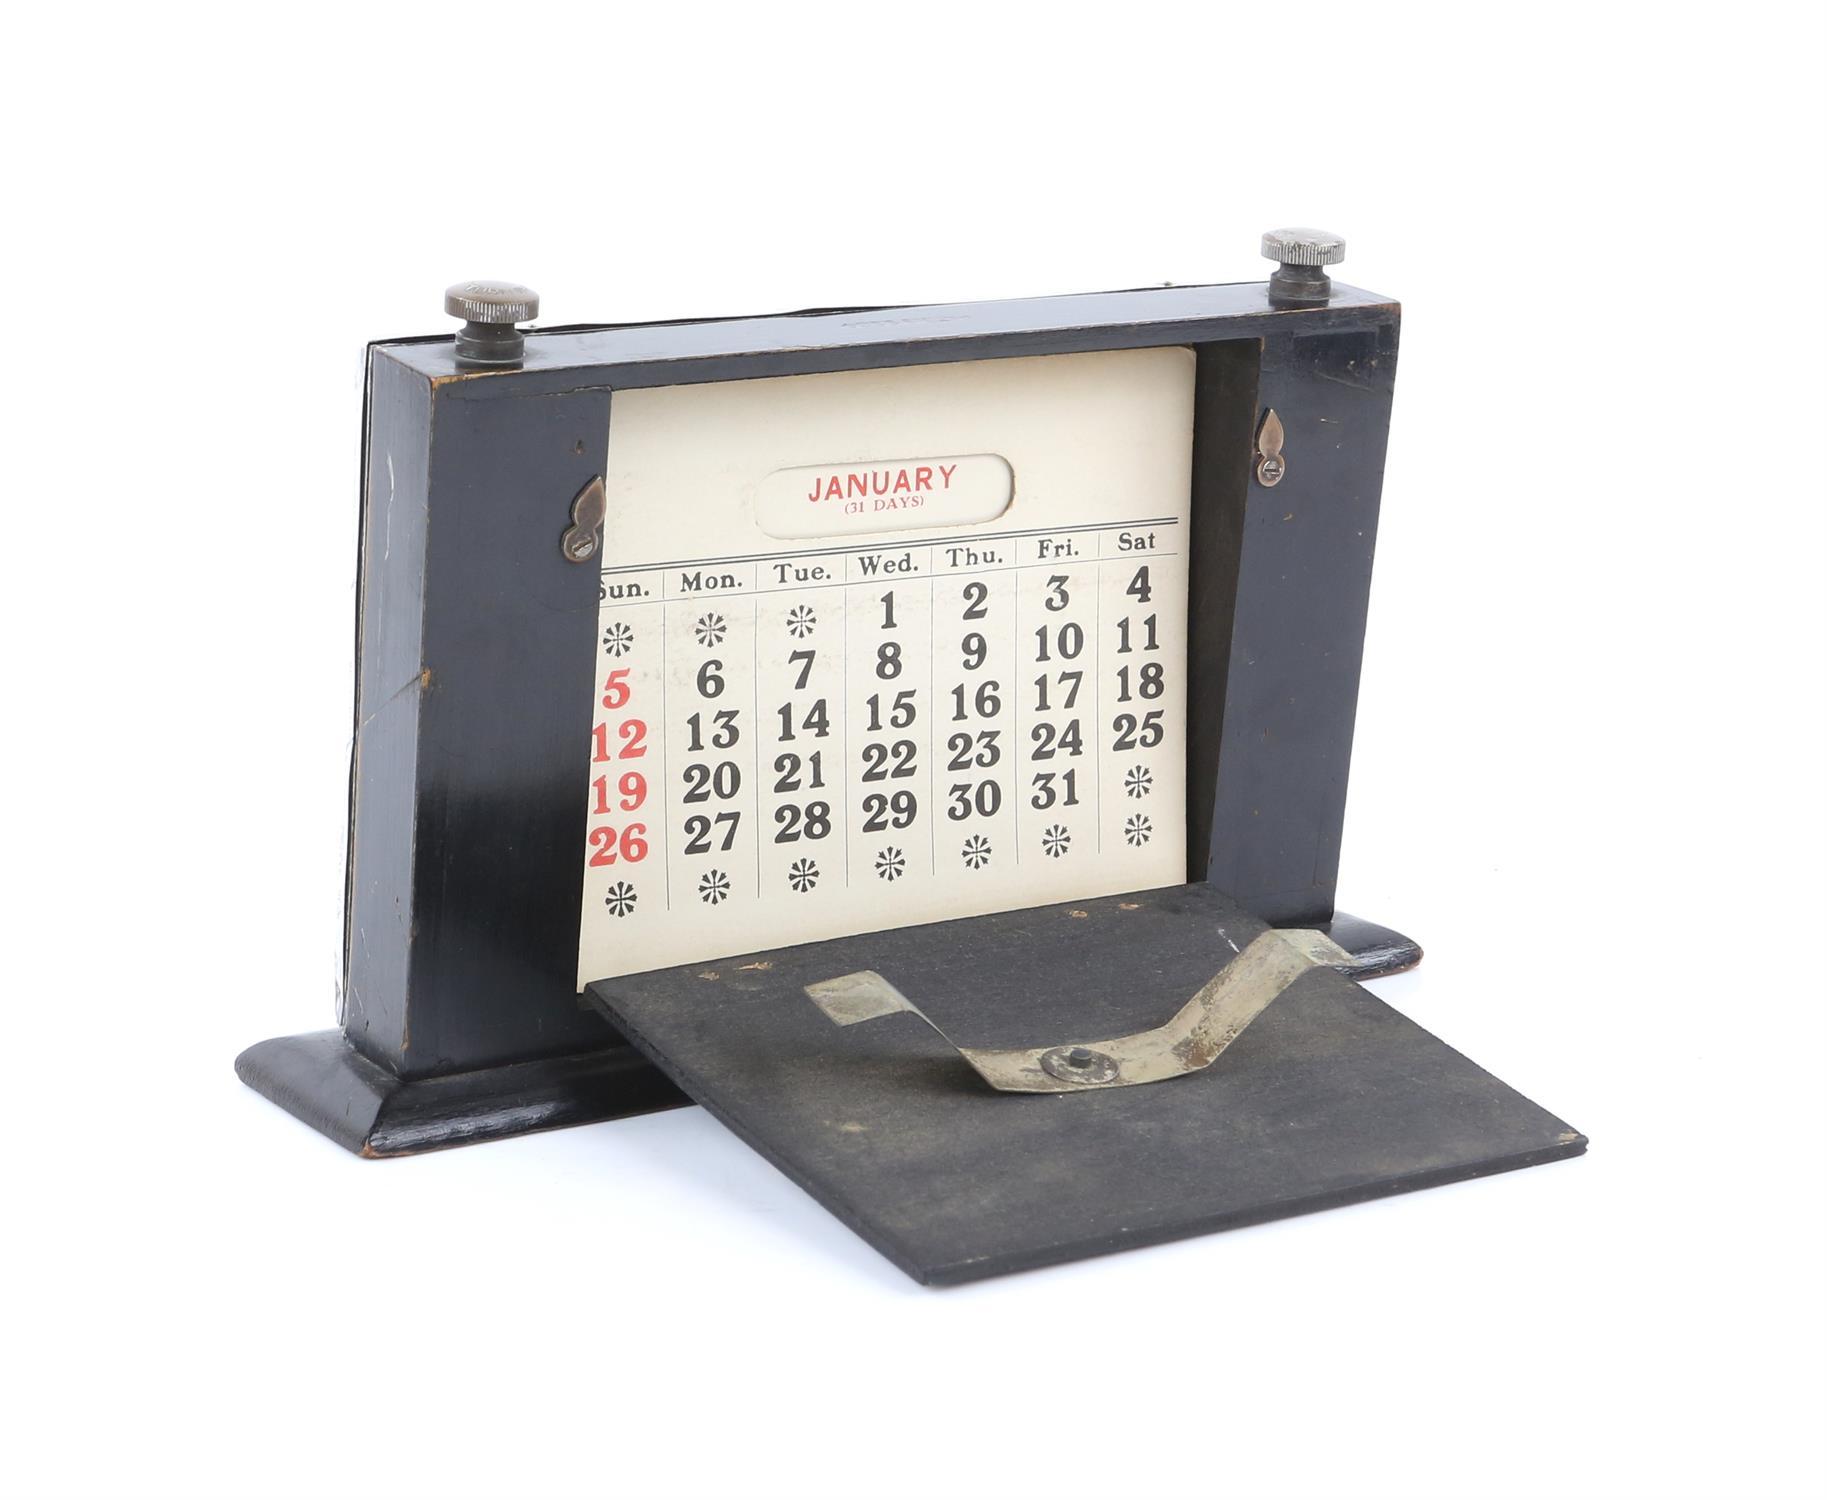 Silver presentation desk calendar, Birmingham 1927, capstan inkwell, page mark, coffee spoons, - Image 2 of 14